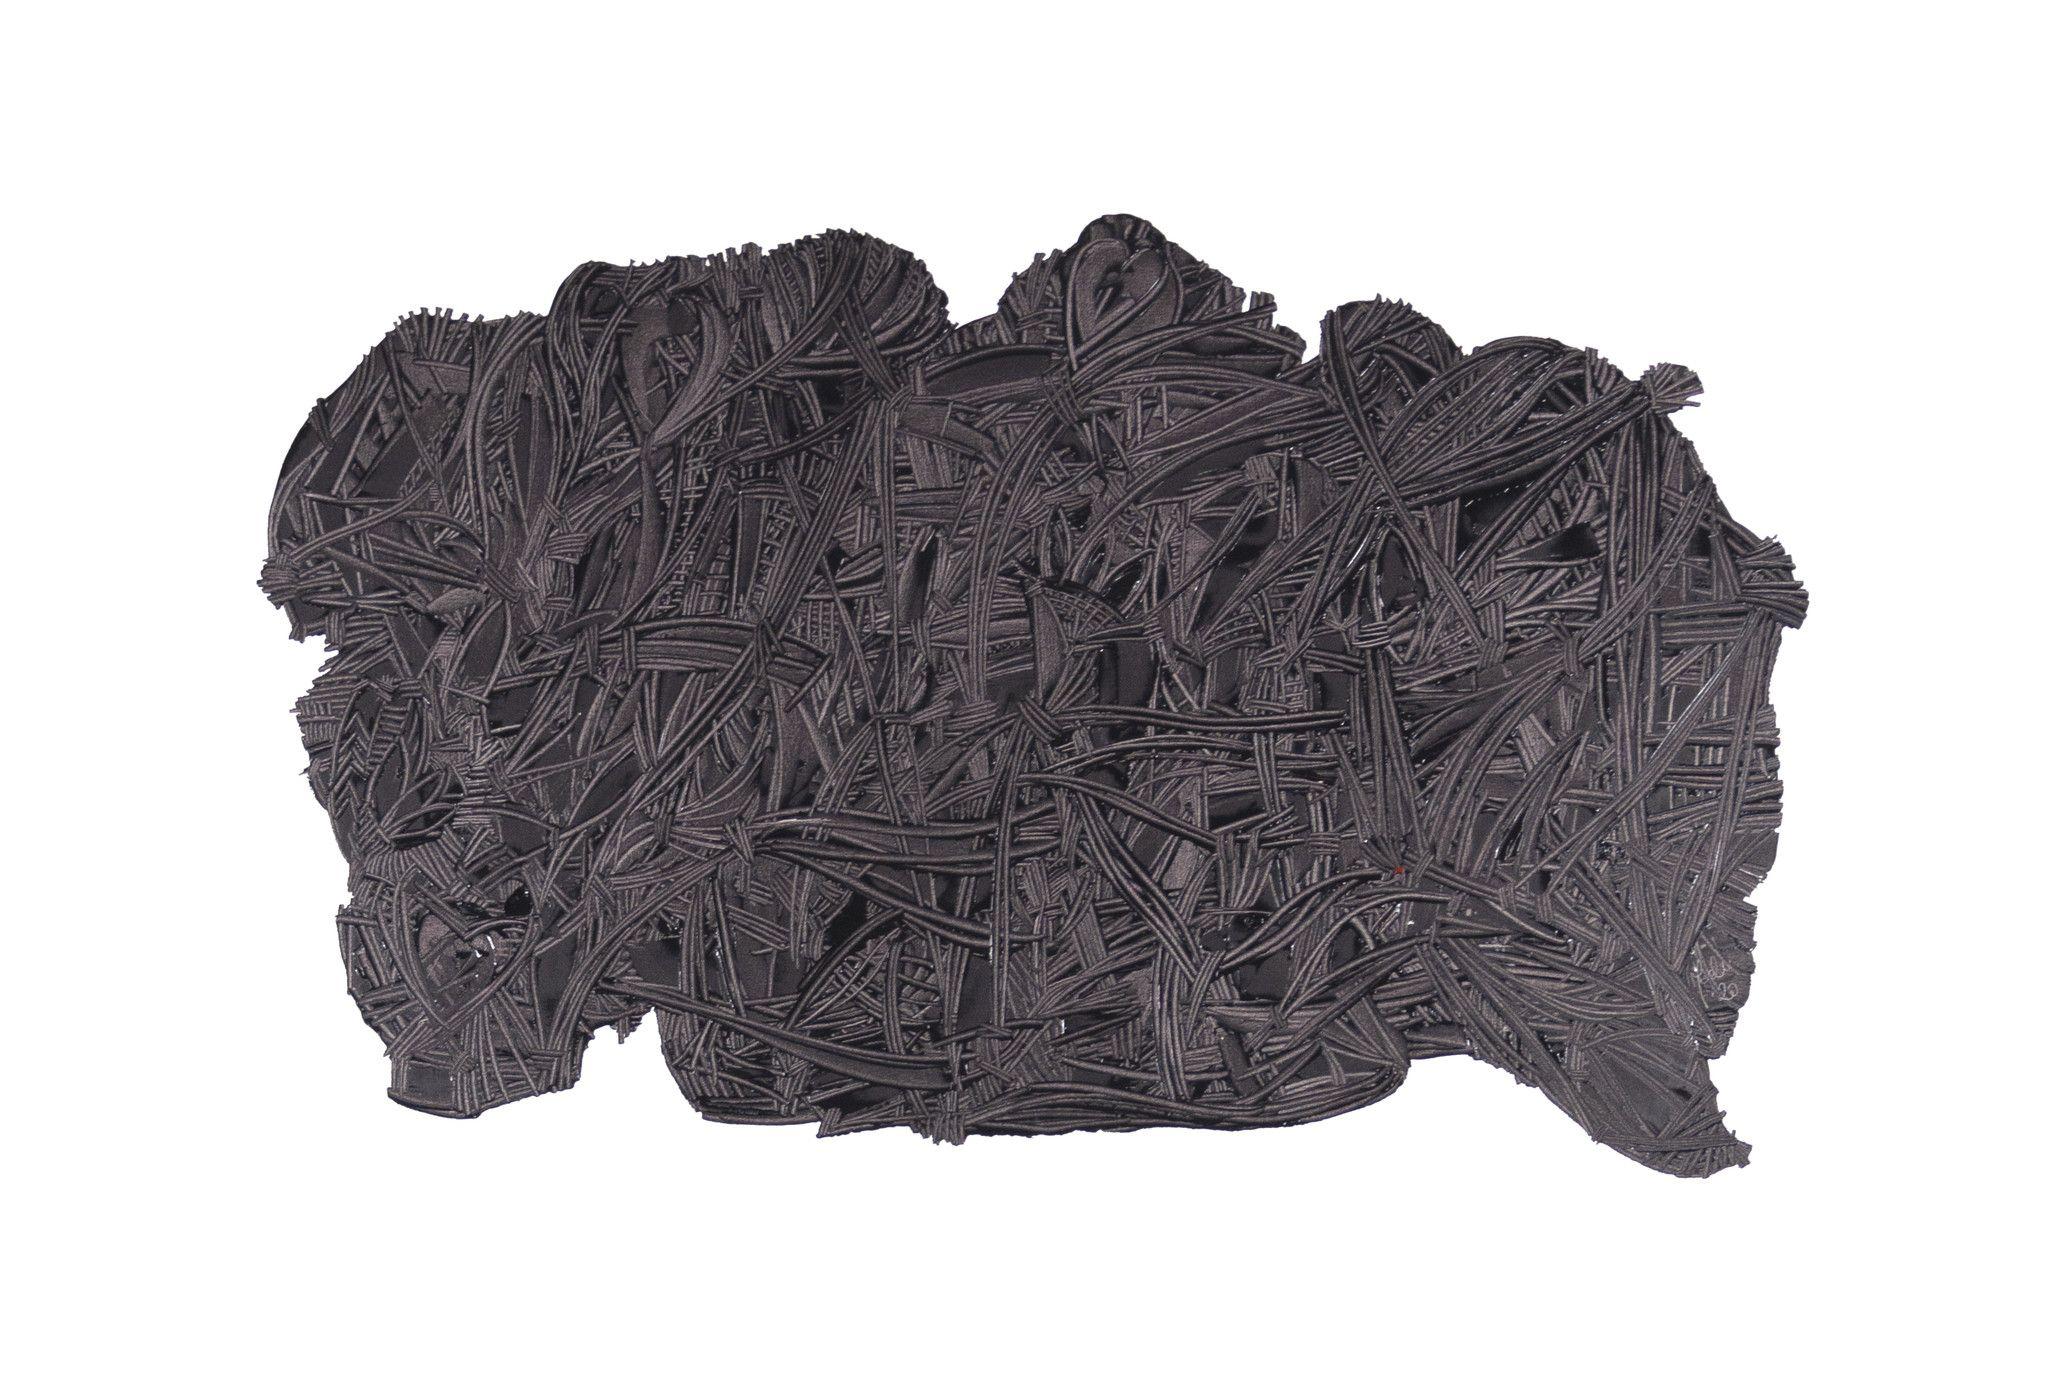 OLIO SU TELA ERIKA MARCHI ' I WANT TO BREAK FREE '  dimensioni L 150 x H 100 cm.